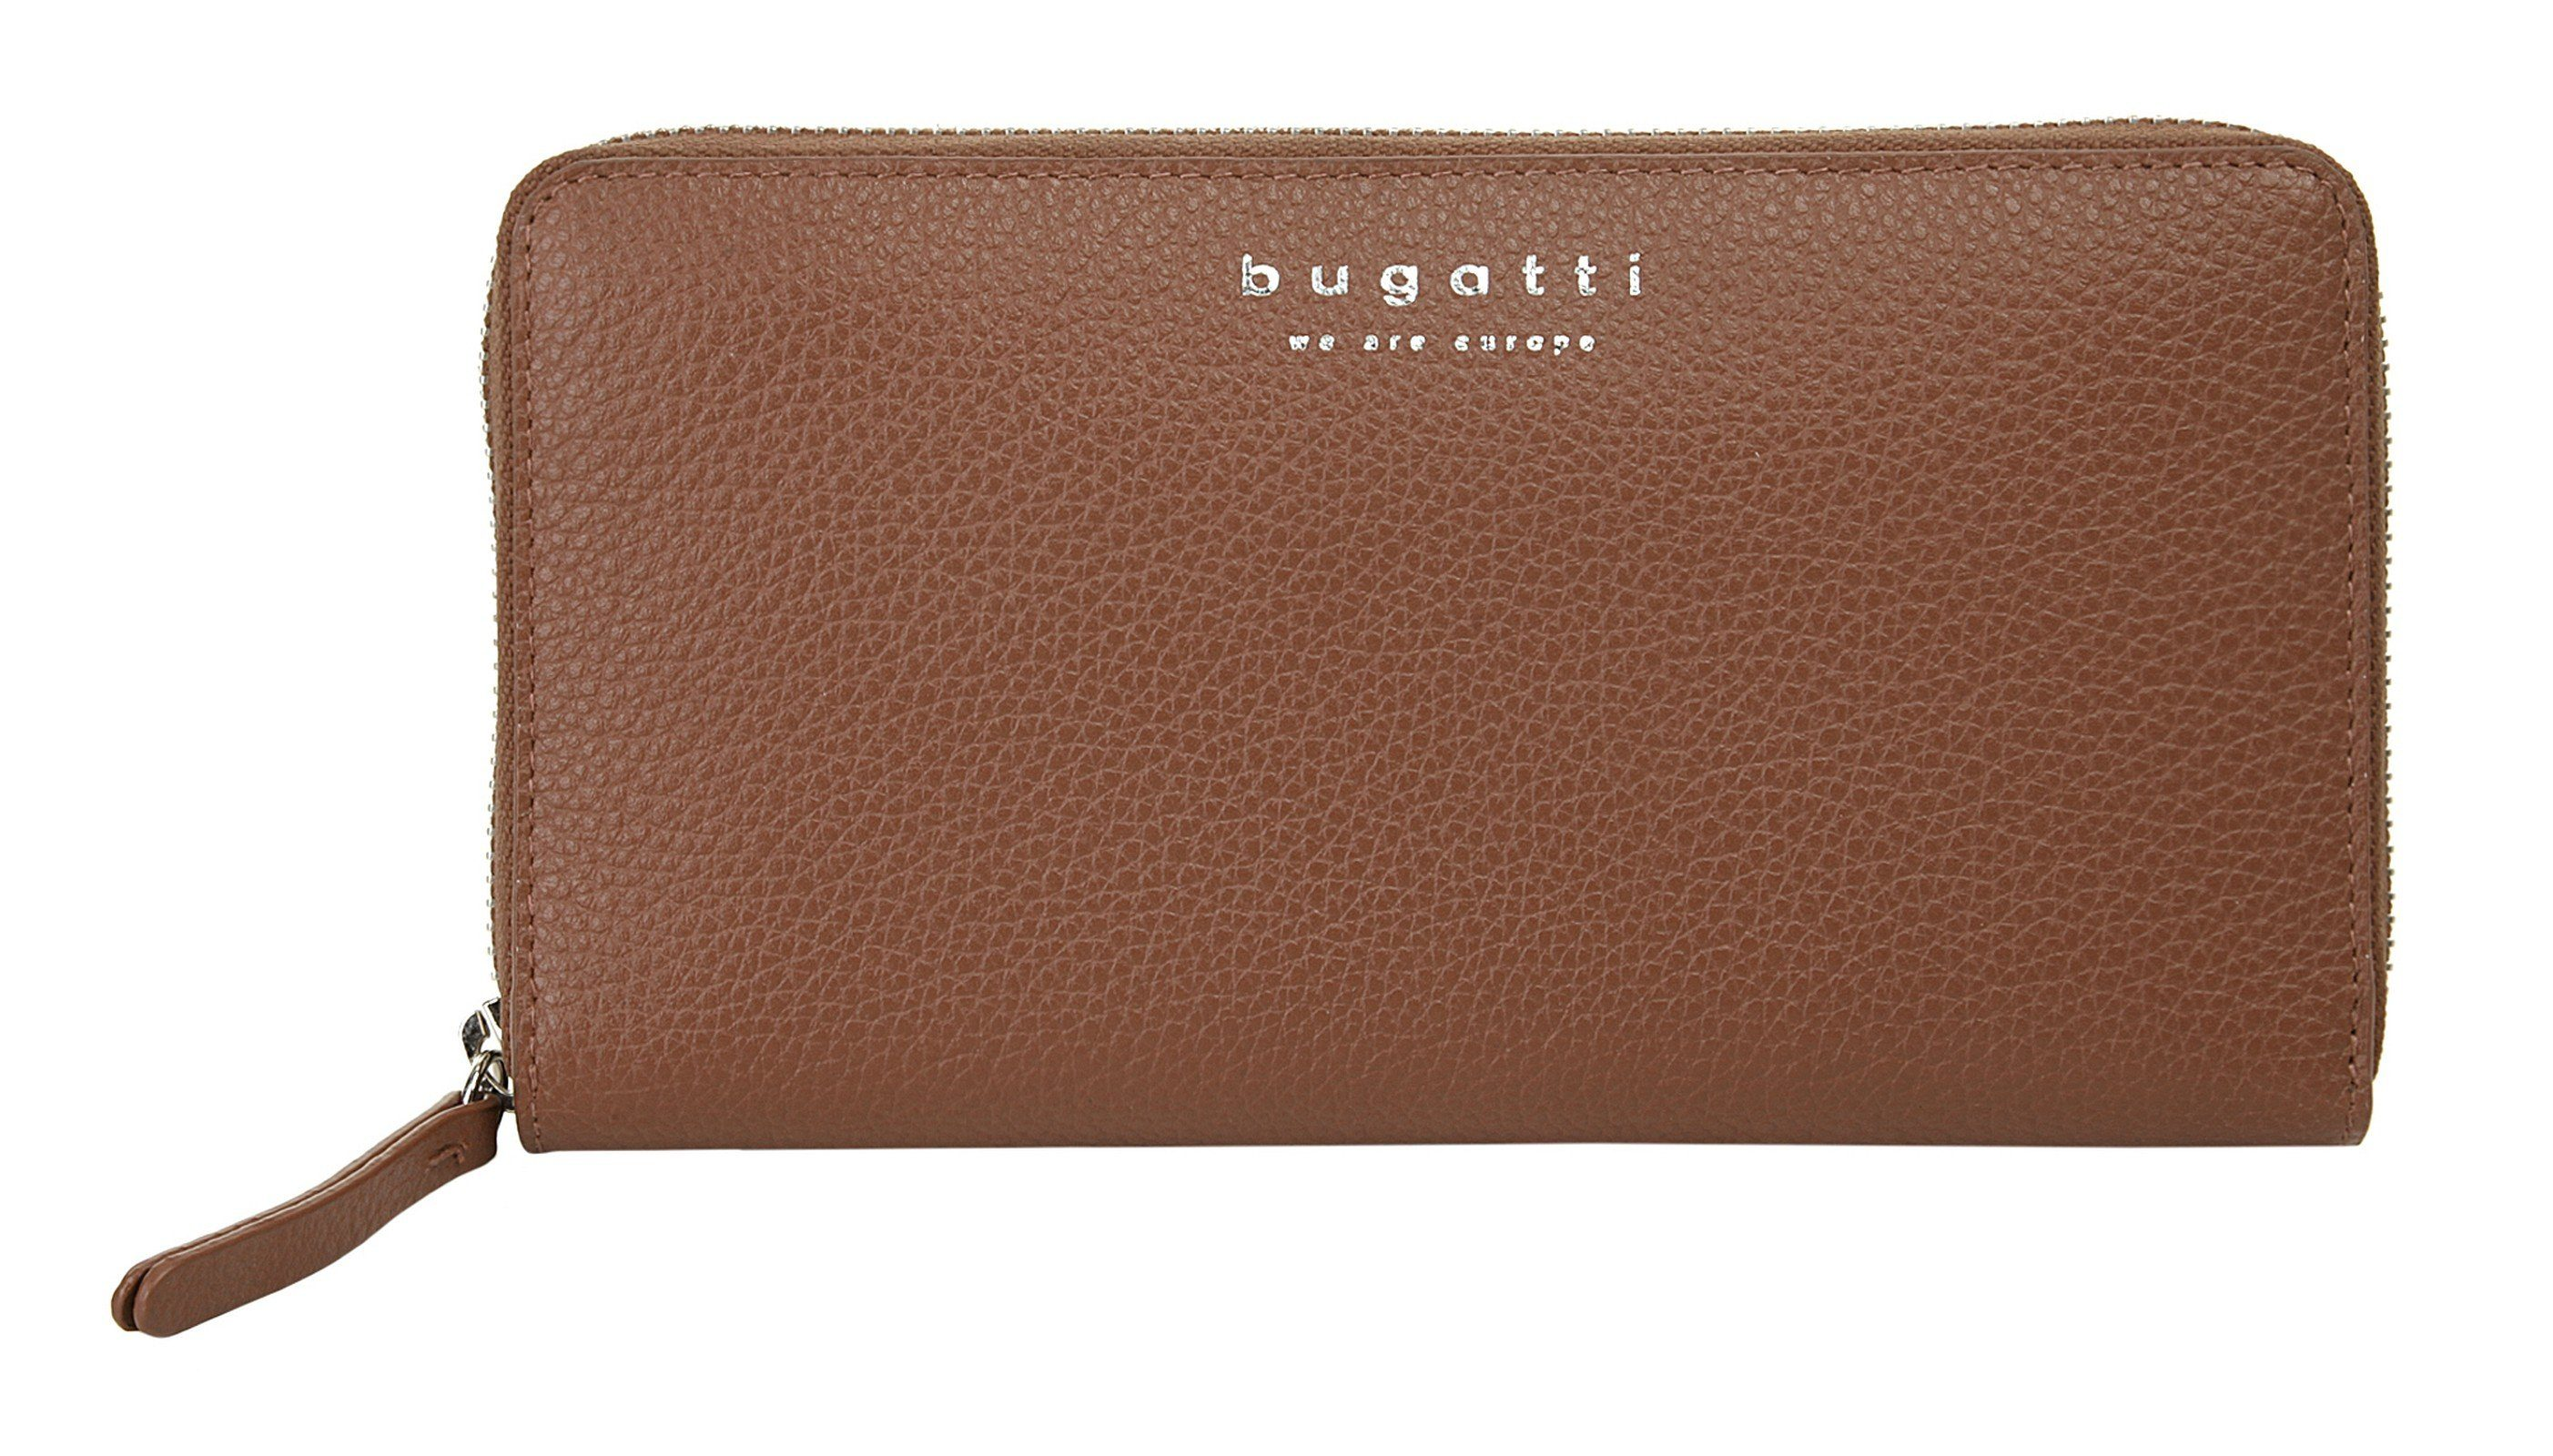 Online Bugatti Geldbörse »linda«Fotofach Geldbörse Kaufen Bugatti »linda«Fotofach Online eEDI2YH9W